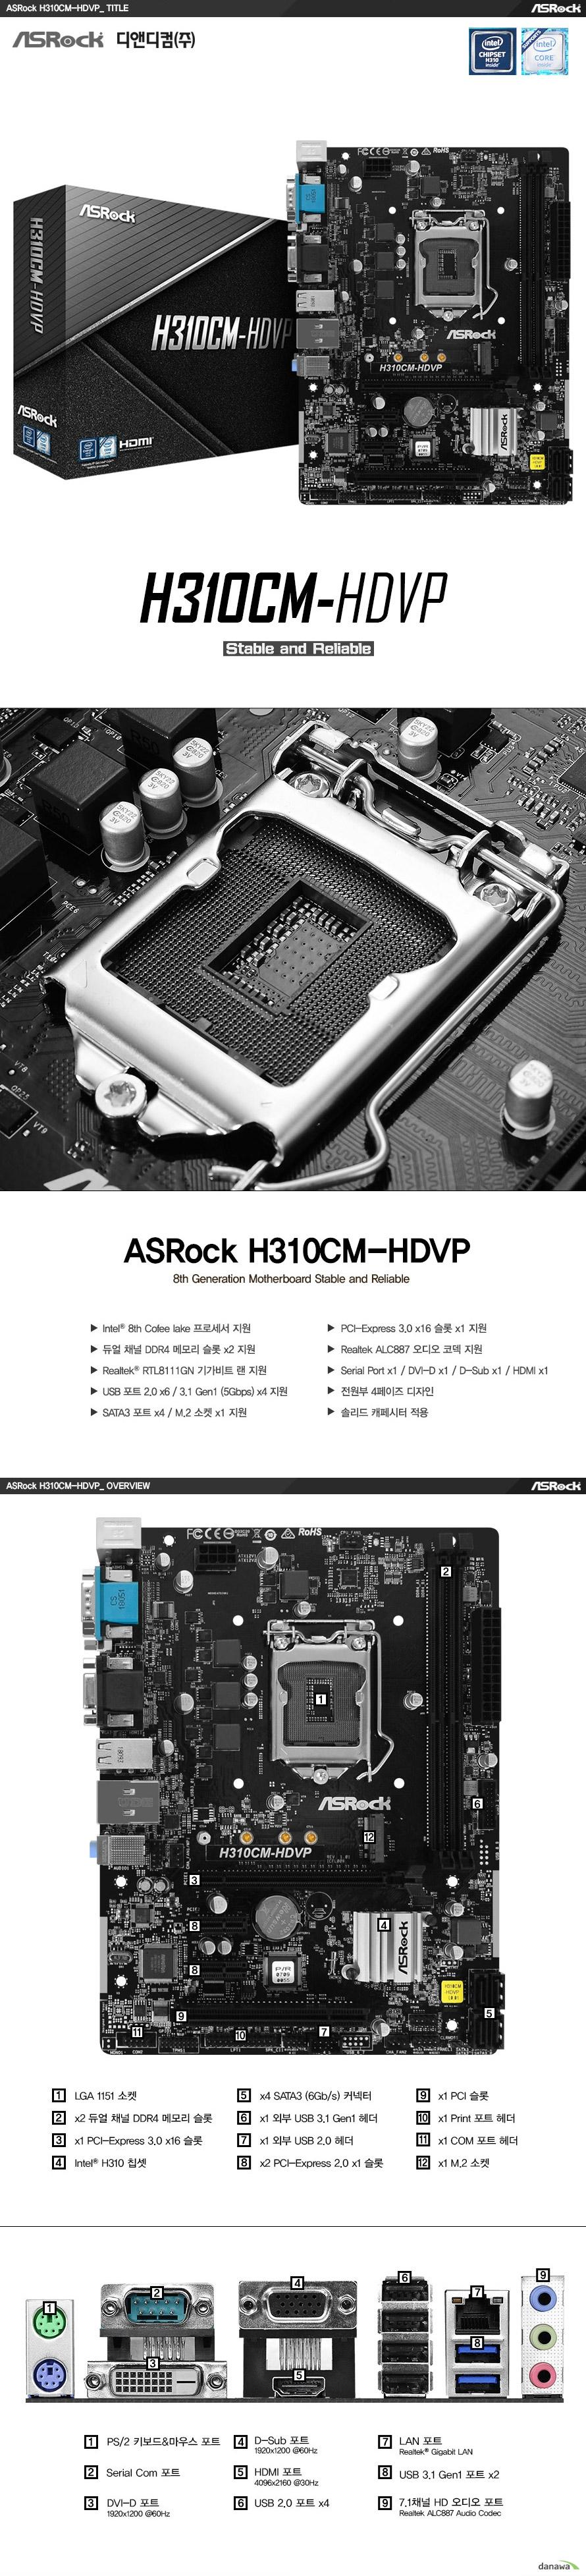 ASROCK H310CM HDVP 디앤디컴  8세대 인텔 프로세서 지원 LGA1151소켓 95와트 CPU지원 인텔 터보 부스트 테크놀러지 2.0 지원  인텔 H310 칩셋 지원  듀얼채널 DDR4 DIMM 메모리 지원 최대 32GB 메모리 지원 DDR4 2666 2400 2133 NON ECC UN BUFFERED 메모리 지원 XMP 2.0 지원  PCIE 3.0 X16 슬롯 1개  PCIE 2.0 X1 슬롯 2개 PCI 슬롯 1개  리얼텍 RTL8111GN 기가비트 랜 지원  SATA3 커넥터 4개 지원 2230 2242 2260 2280규격 M.2 소켓 1개 지원  USB 3.0 4개 및 2.0 6개 지원  KC인증 R R ASR H310CMHDVP  제조사의 사정에 따라 사전고지 없이 일부 제품사양이 변경될 수 있습니다. 구매 전 파워 서플라이의 CPU 프로세서 지원 여부를 확인하시기 바랍니다.  제품 구성   사용자 설명서 드라이버 CD IO쉴드  최고의 고객 만족을 위하여 3년 무상 품질 보증 서비스를 제공합니다.